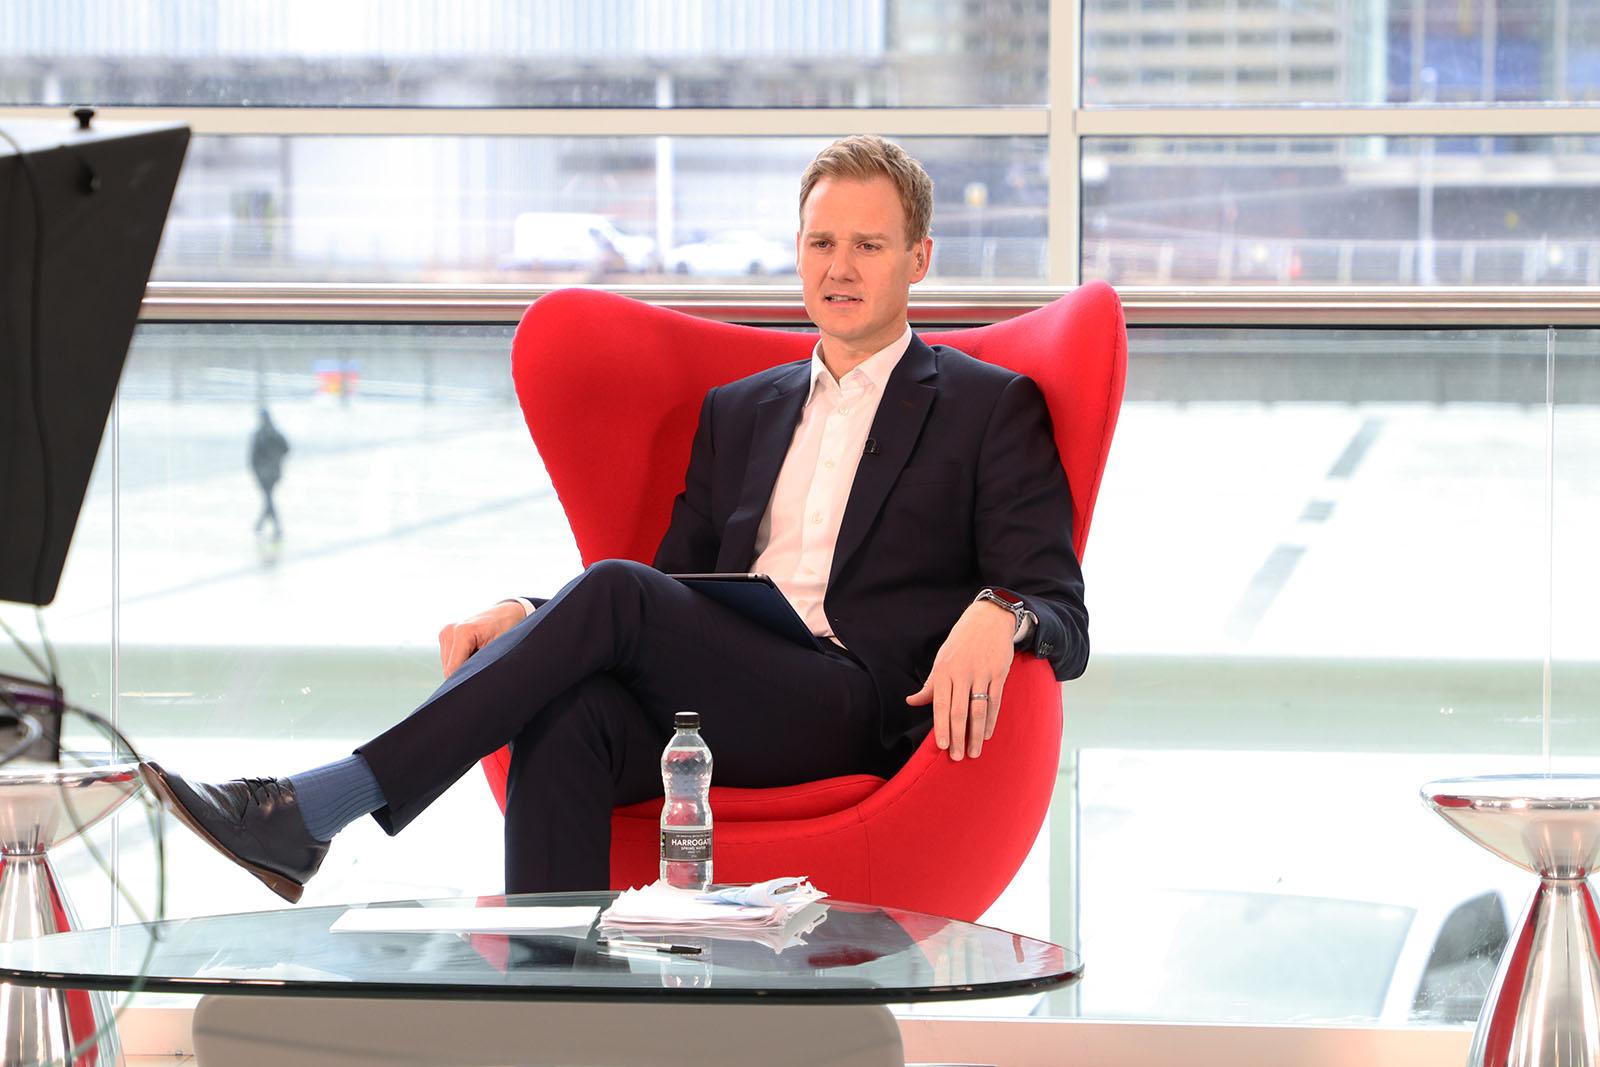 TV Presenter Dan Walke on the set of Best Companies Live at Media City UK